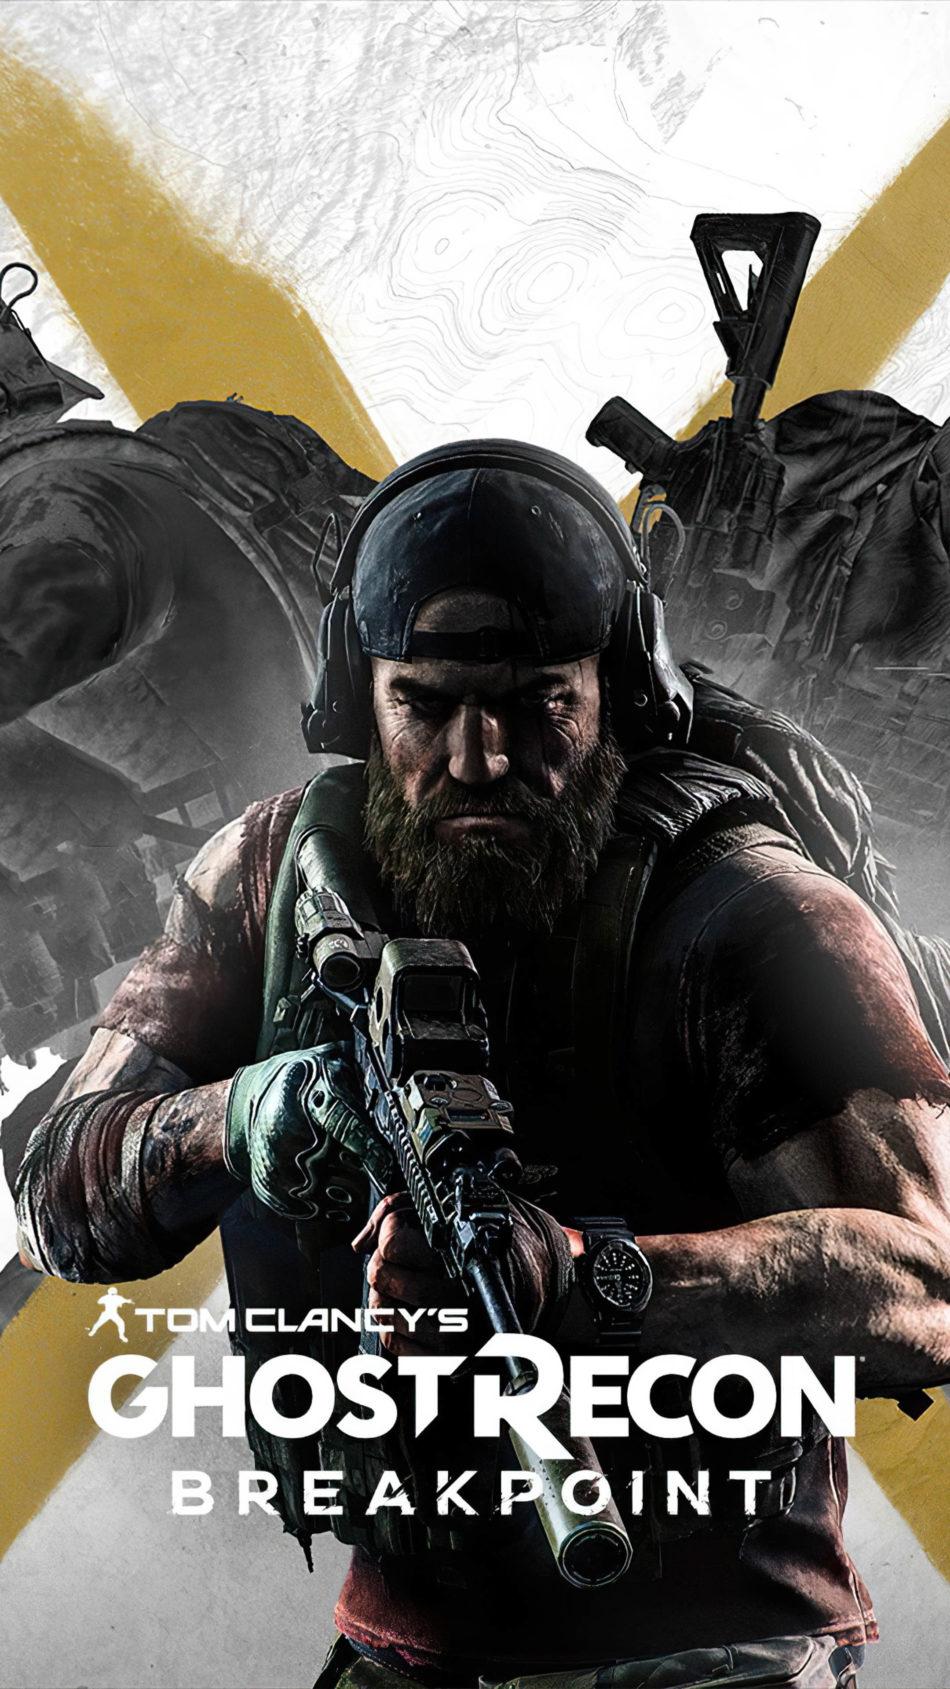 Tom Clancy's Ghost Recon Breakpoint 2020 4K Ultra HD Mobile Wallpaper